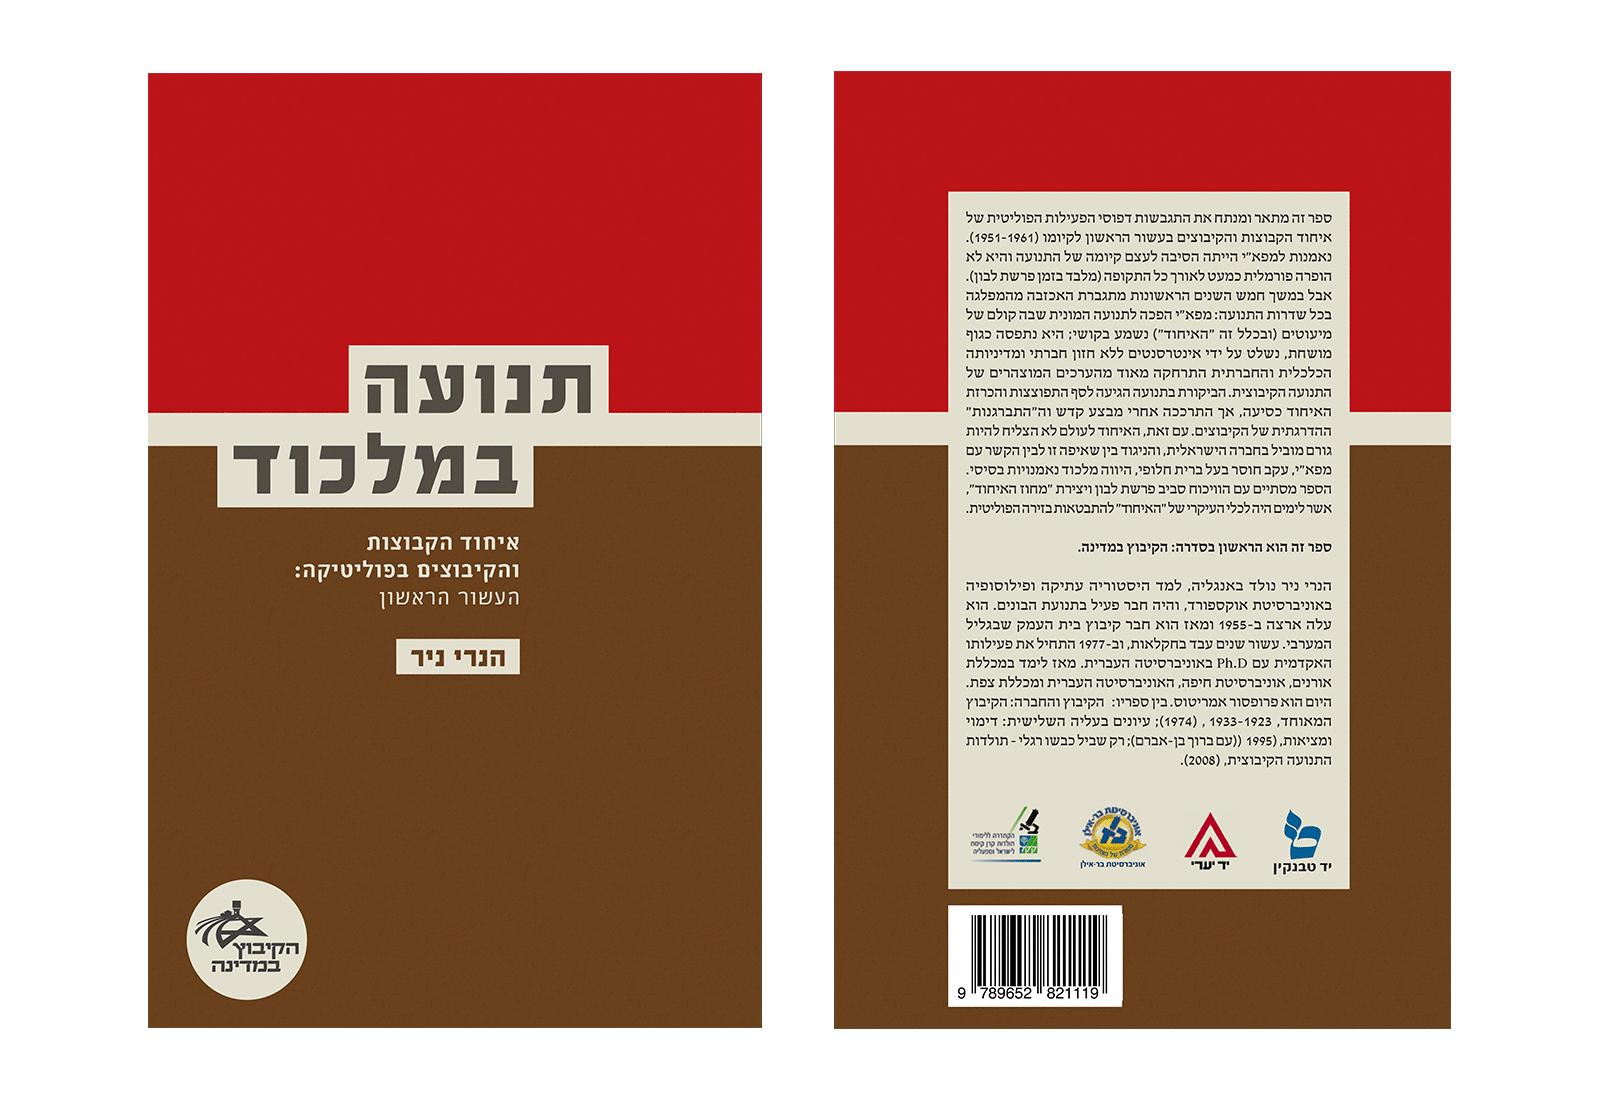 http://bigeyes.co.il/wp-content/uploads/2019/08/kibbutz-books-4.png